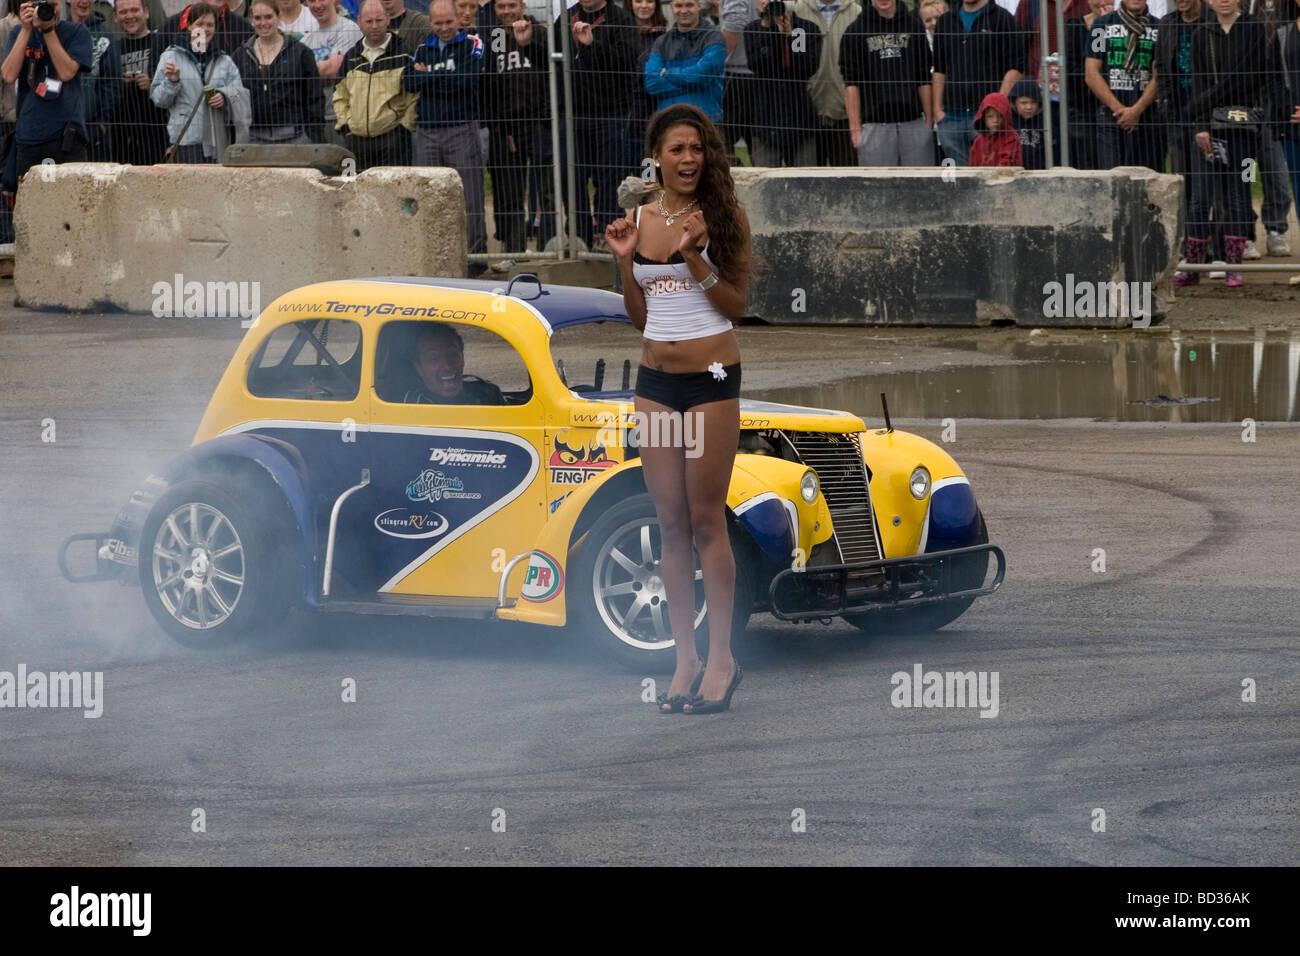 A stunt driver performing a stunt around a model at Santa Pod Raceway - Stock Image